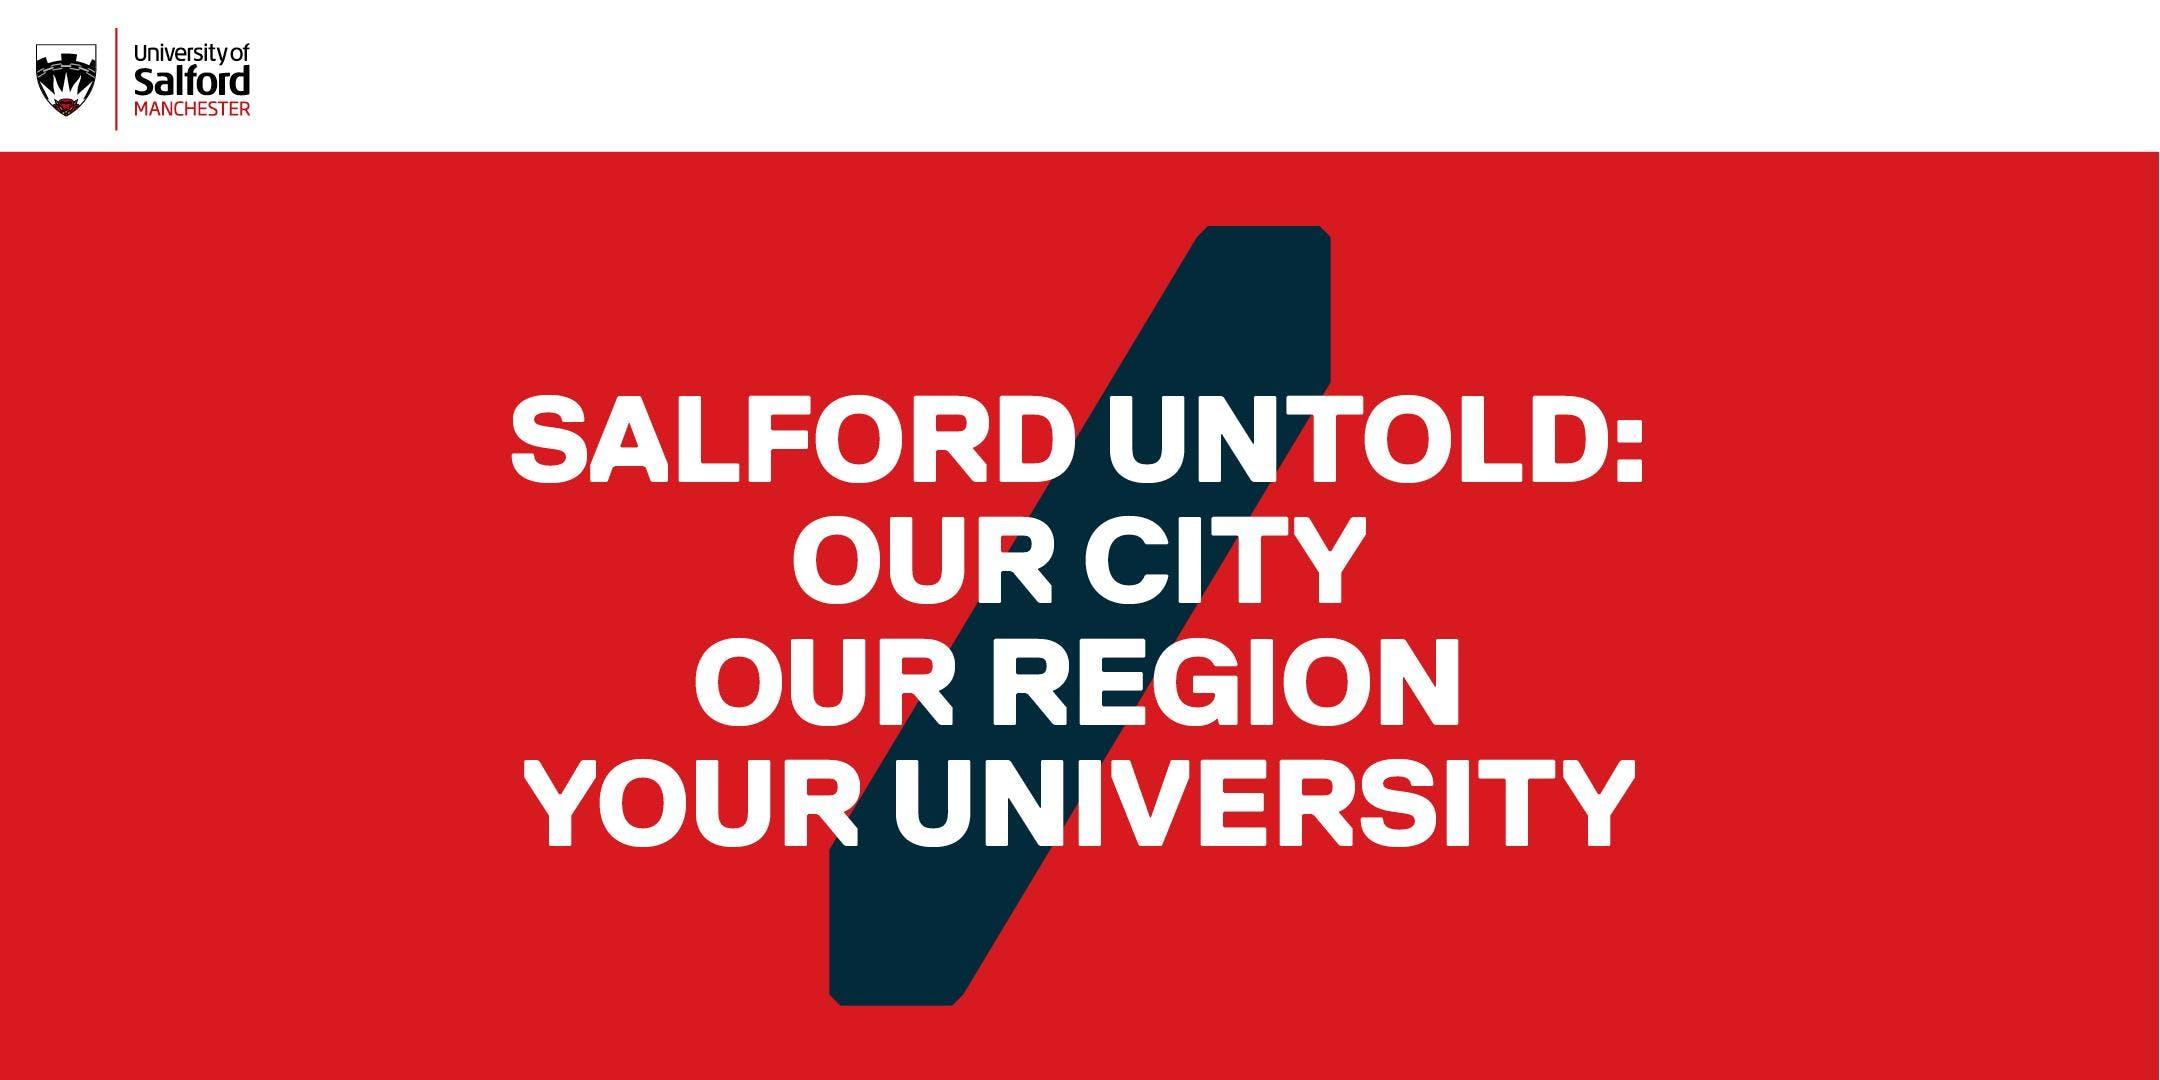 University of Salford - Social and Economic I